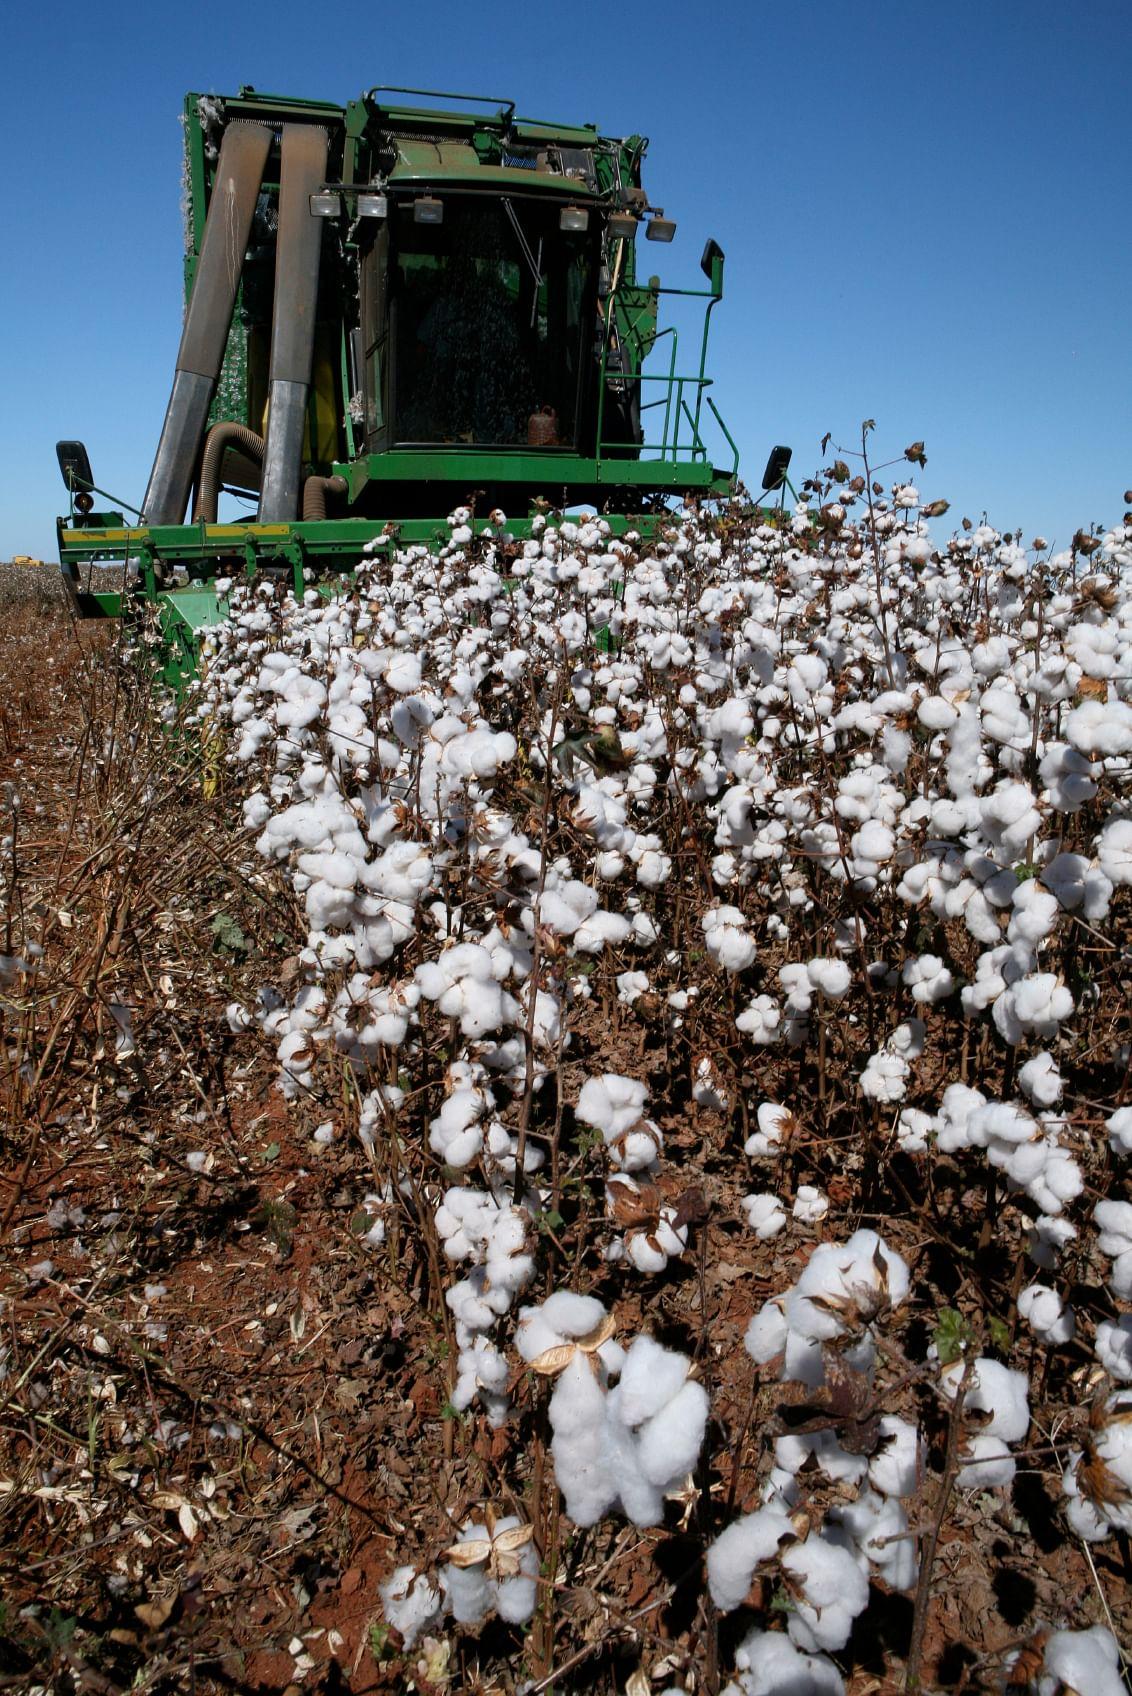 MMBL's Bt cotton technology has 90 percent of the market share. (Photo: iStockphoto)